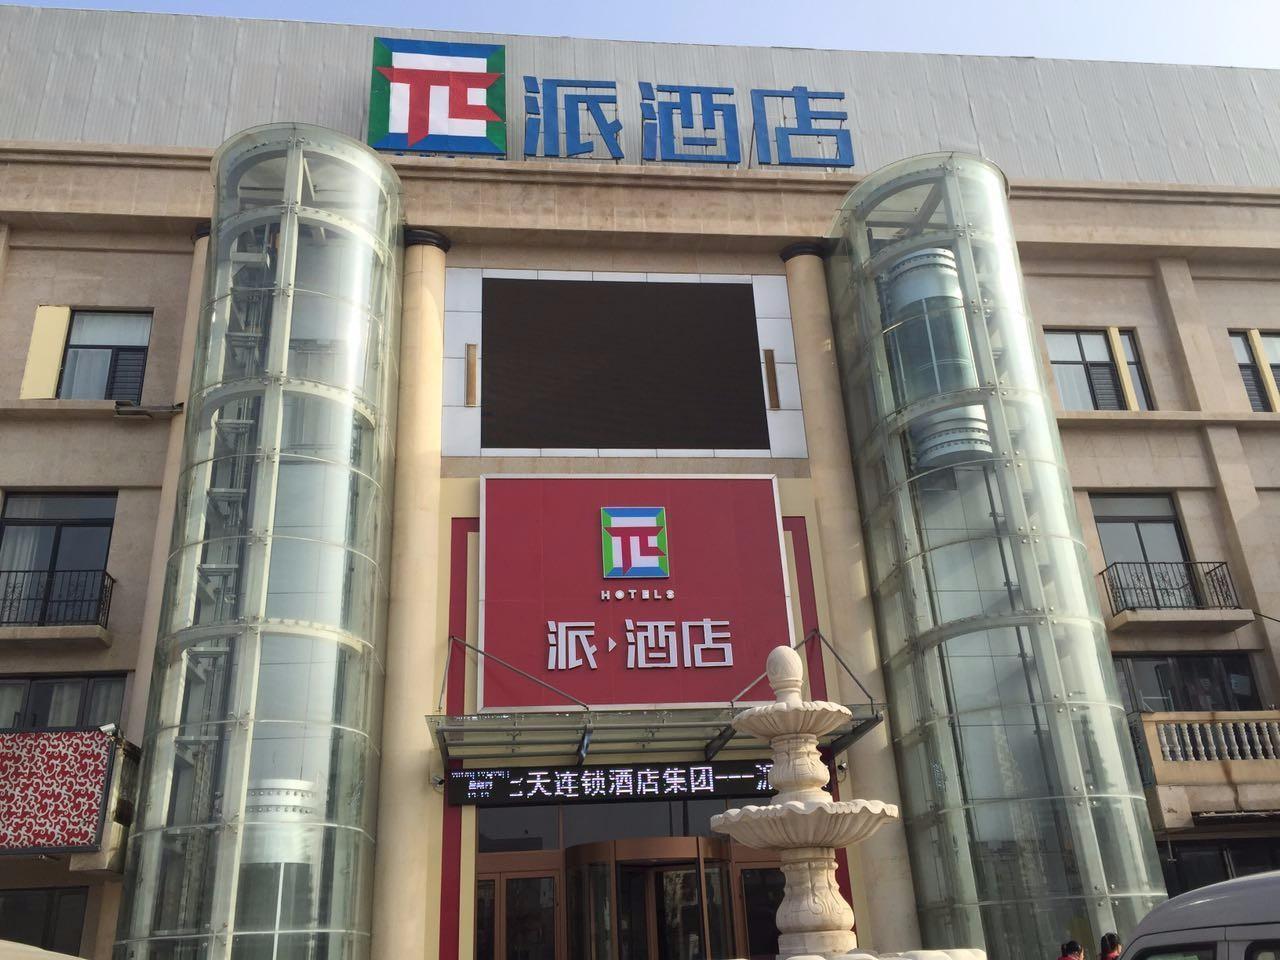 Pai Hotel Heze Shan County Cultural Road Heze University, Heze